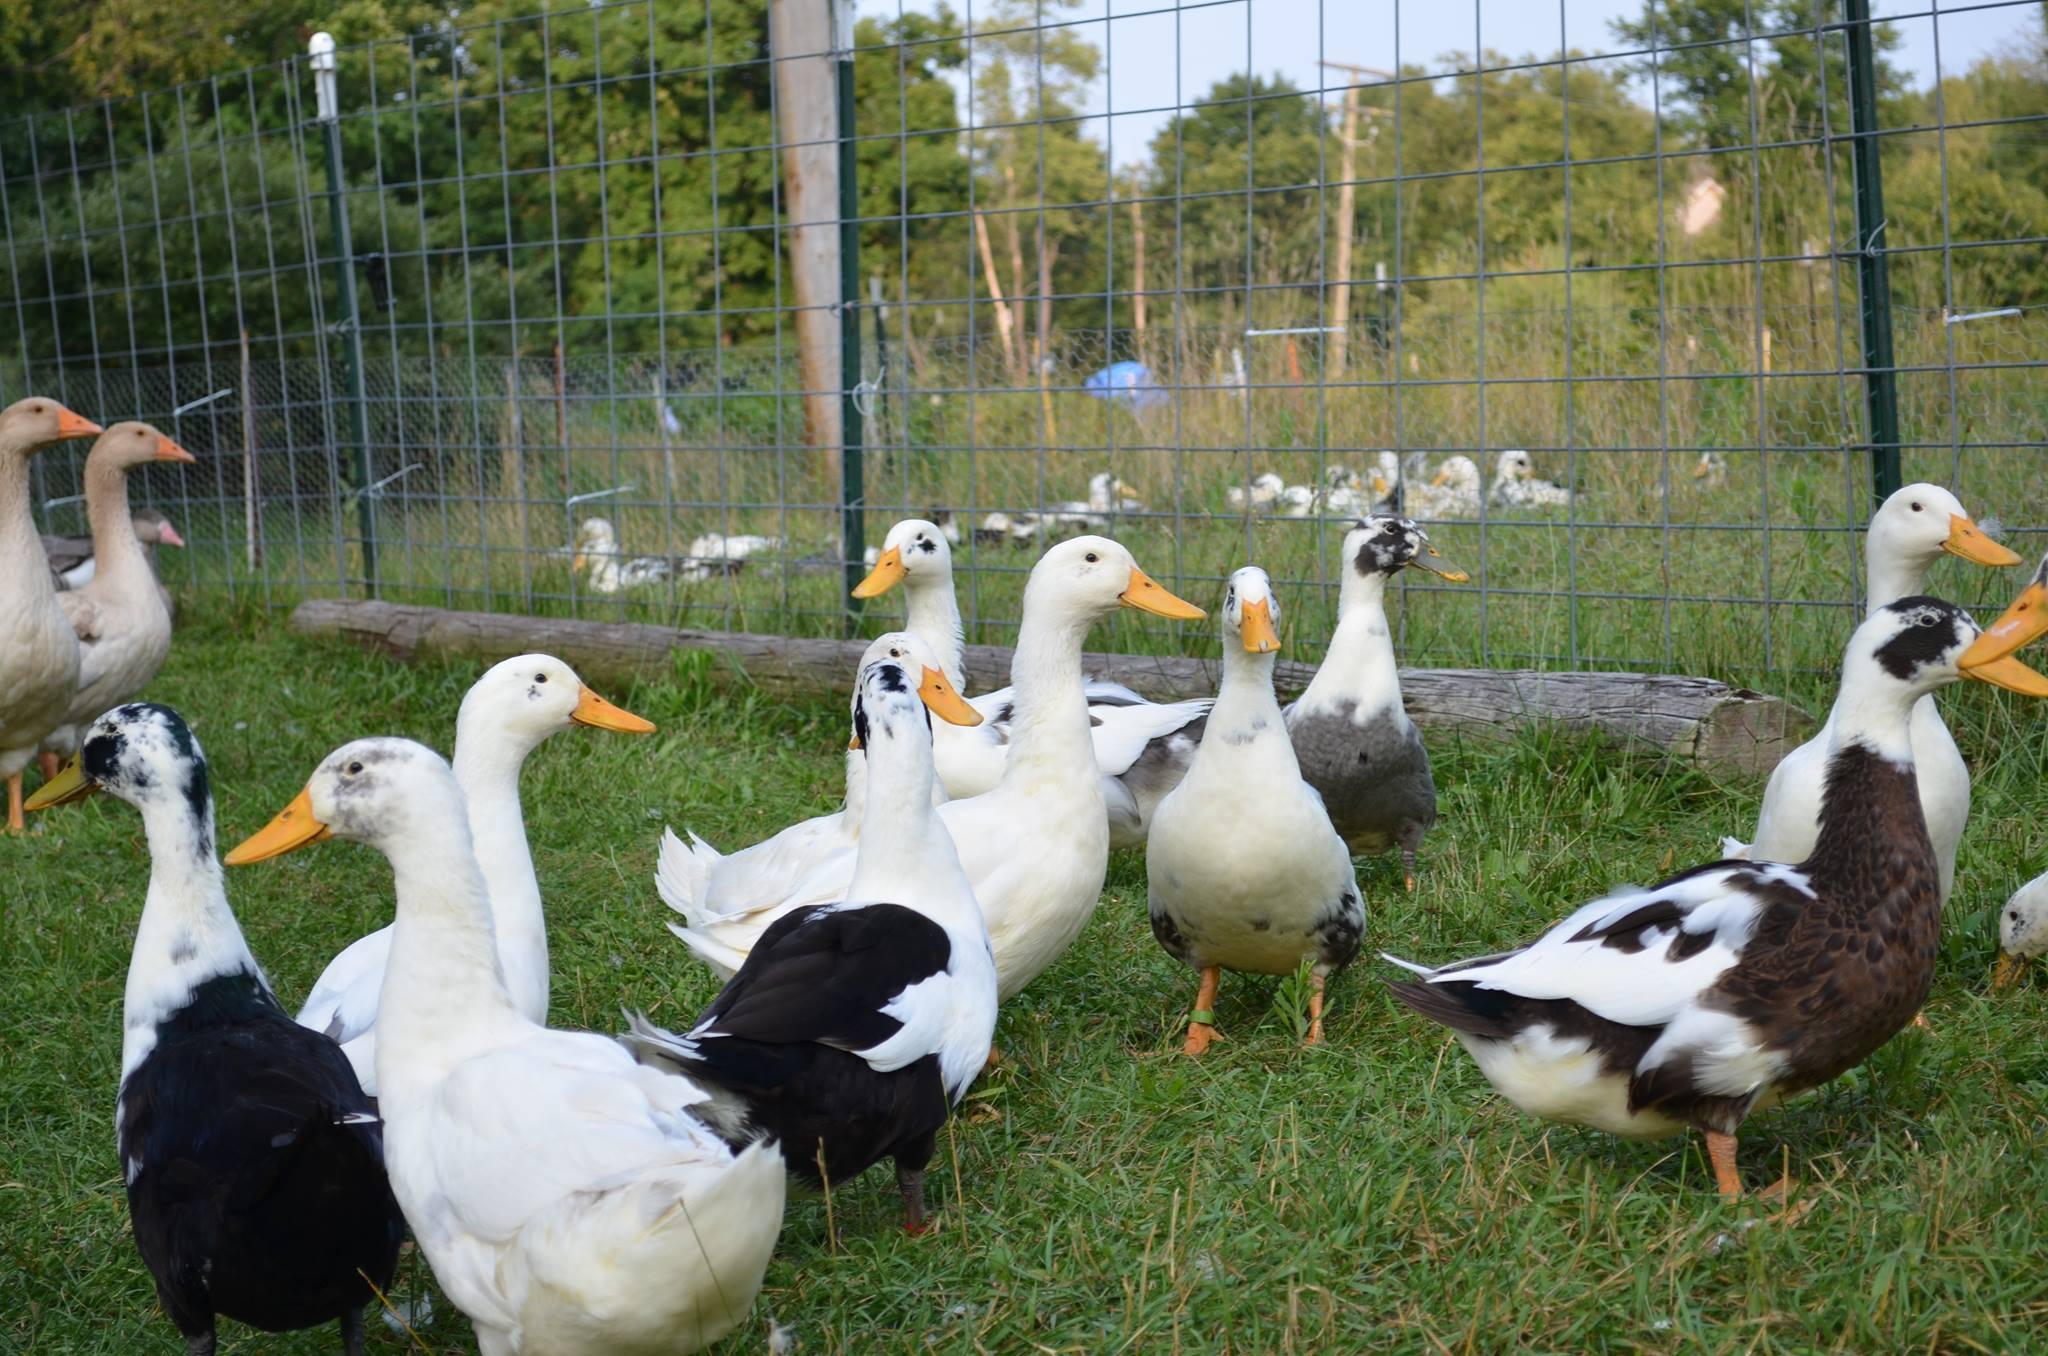 ducks fb.jpg